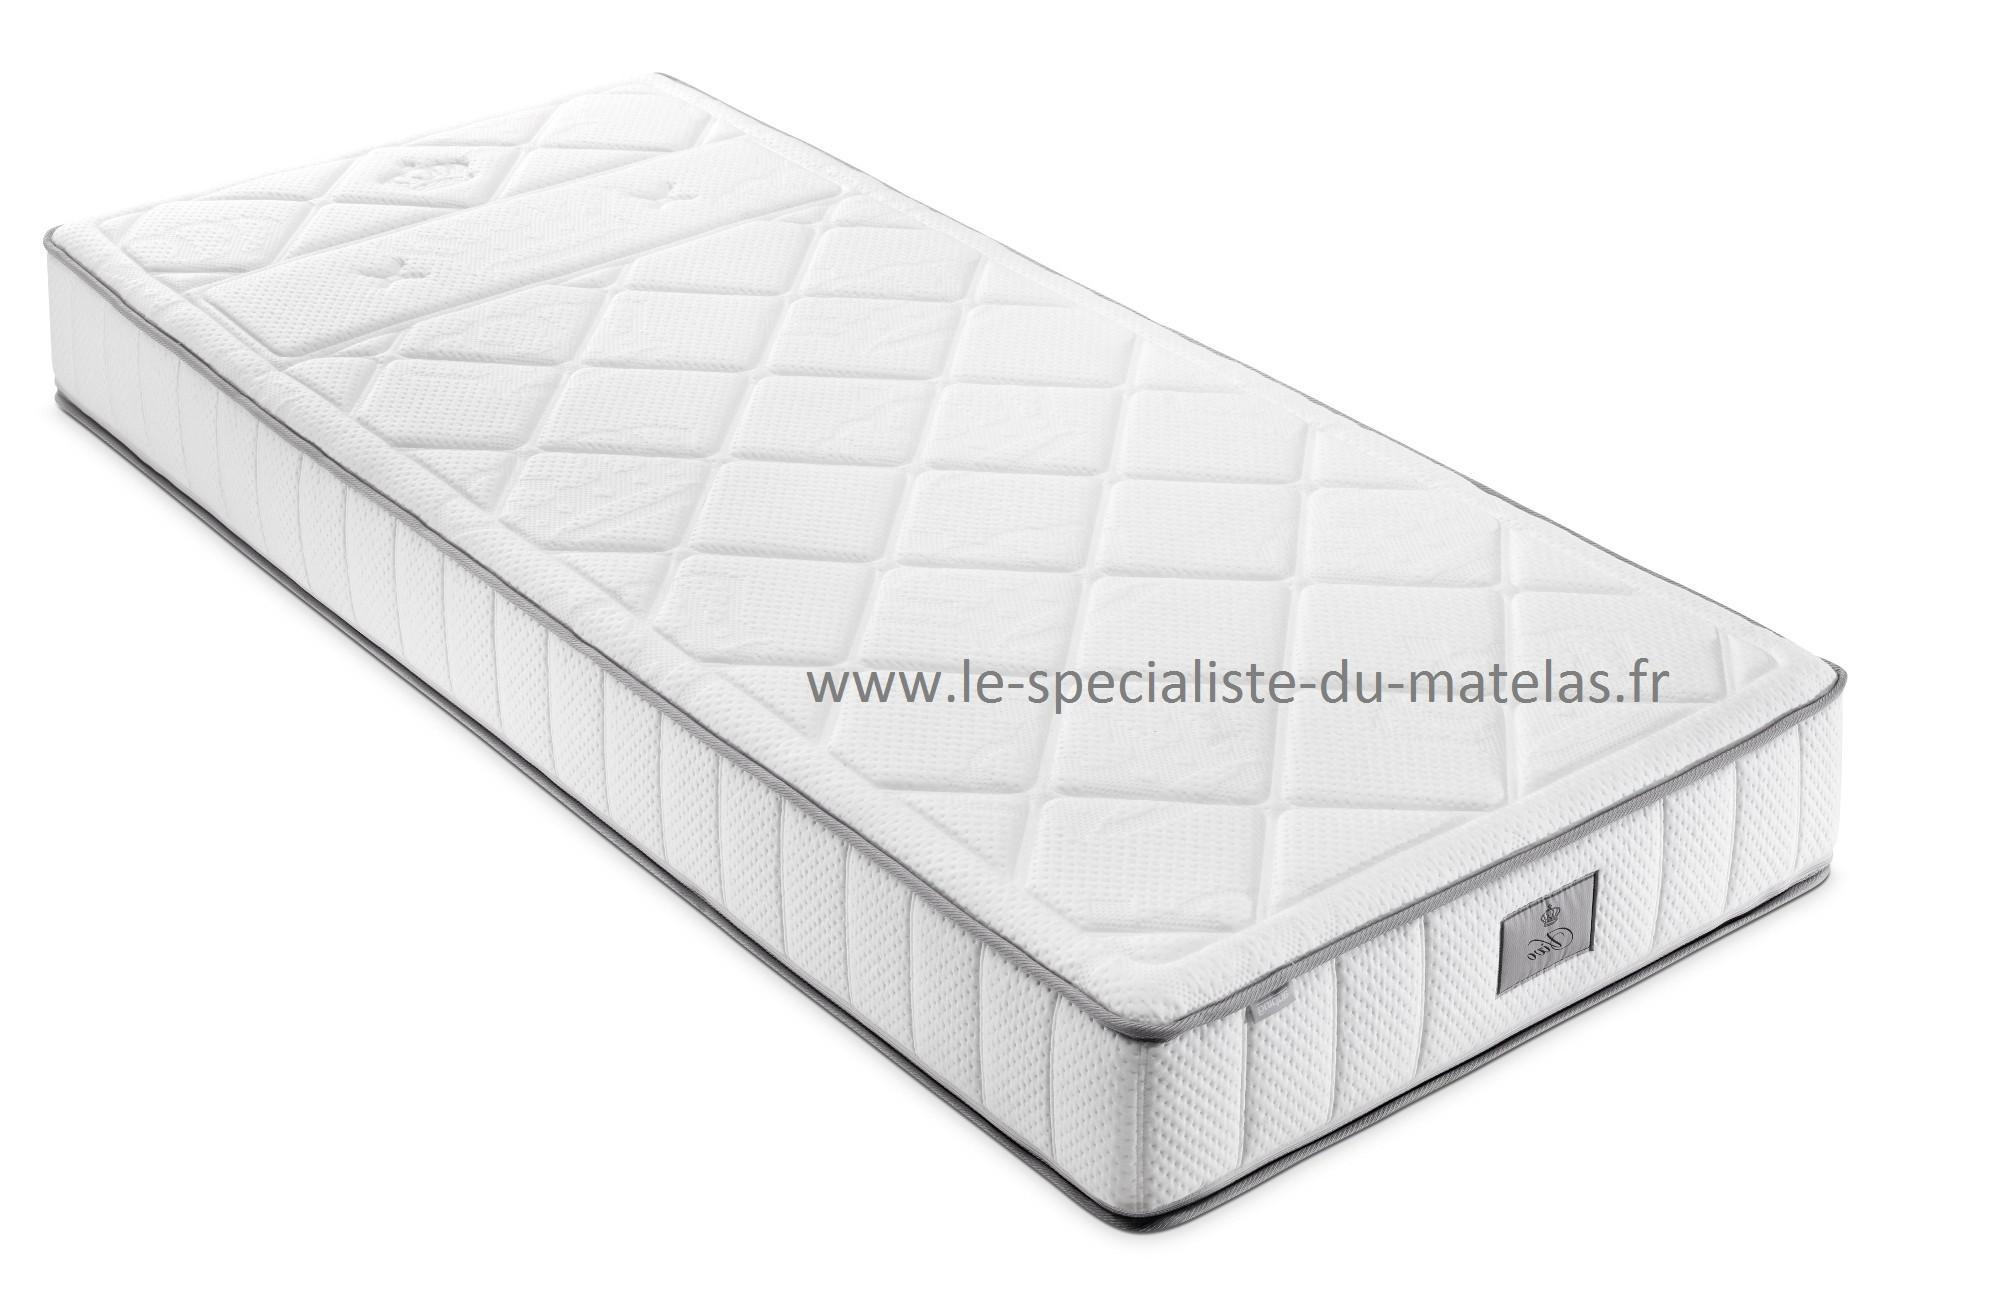 matelas extra ferme affordable argan very firm mattress polilattex cm winter face merino wool. Black Bedroom Furniture Sets. Home Design Ideas